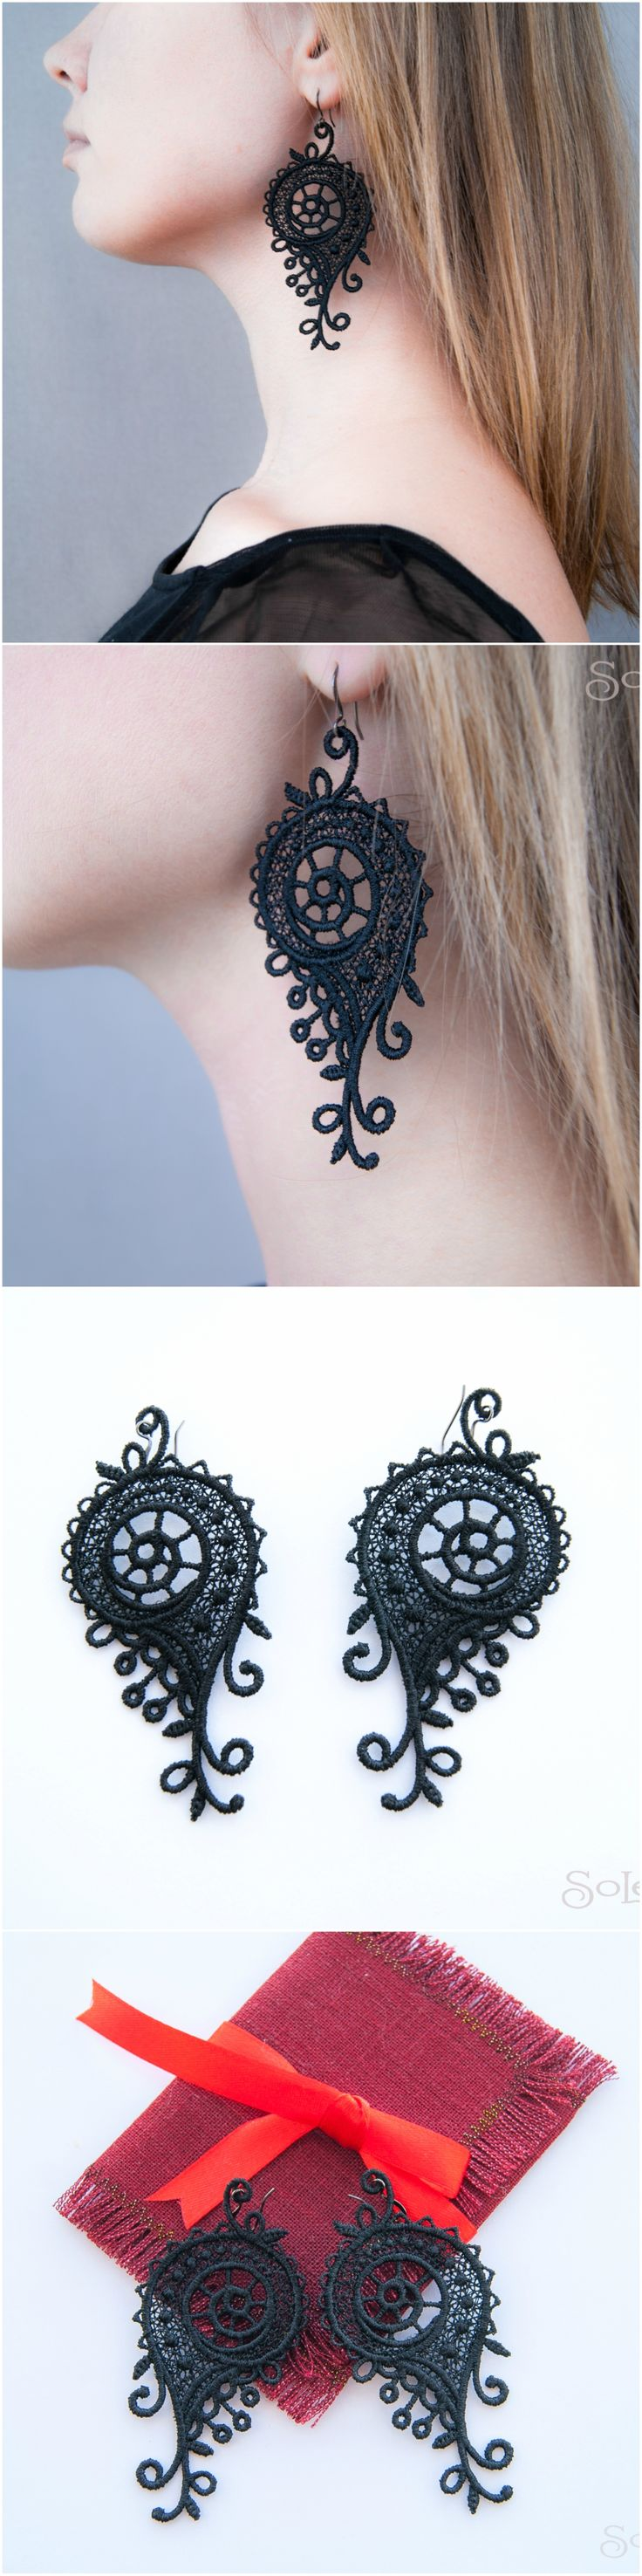 "Lace earrings ""Snails""/ dangle earrings // statement lace jewelry / bohemian long earrings, victorian, unique, boho US$20.50  #Jewellery  #Earrings  #Dangle#Drop #wedding  #victorian  #bridal #art #deco  #statement #black #lace #bohemian  #boho  #gothic  #vintage"